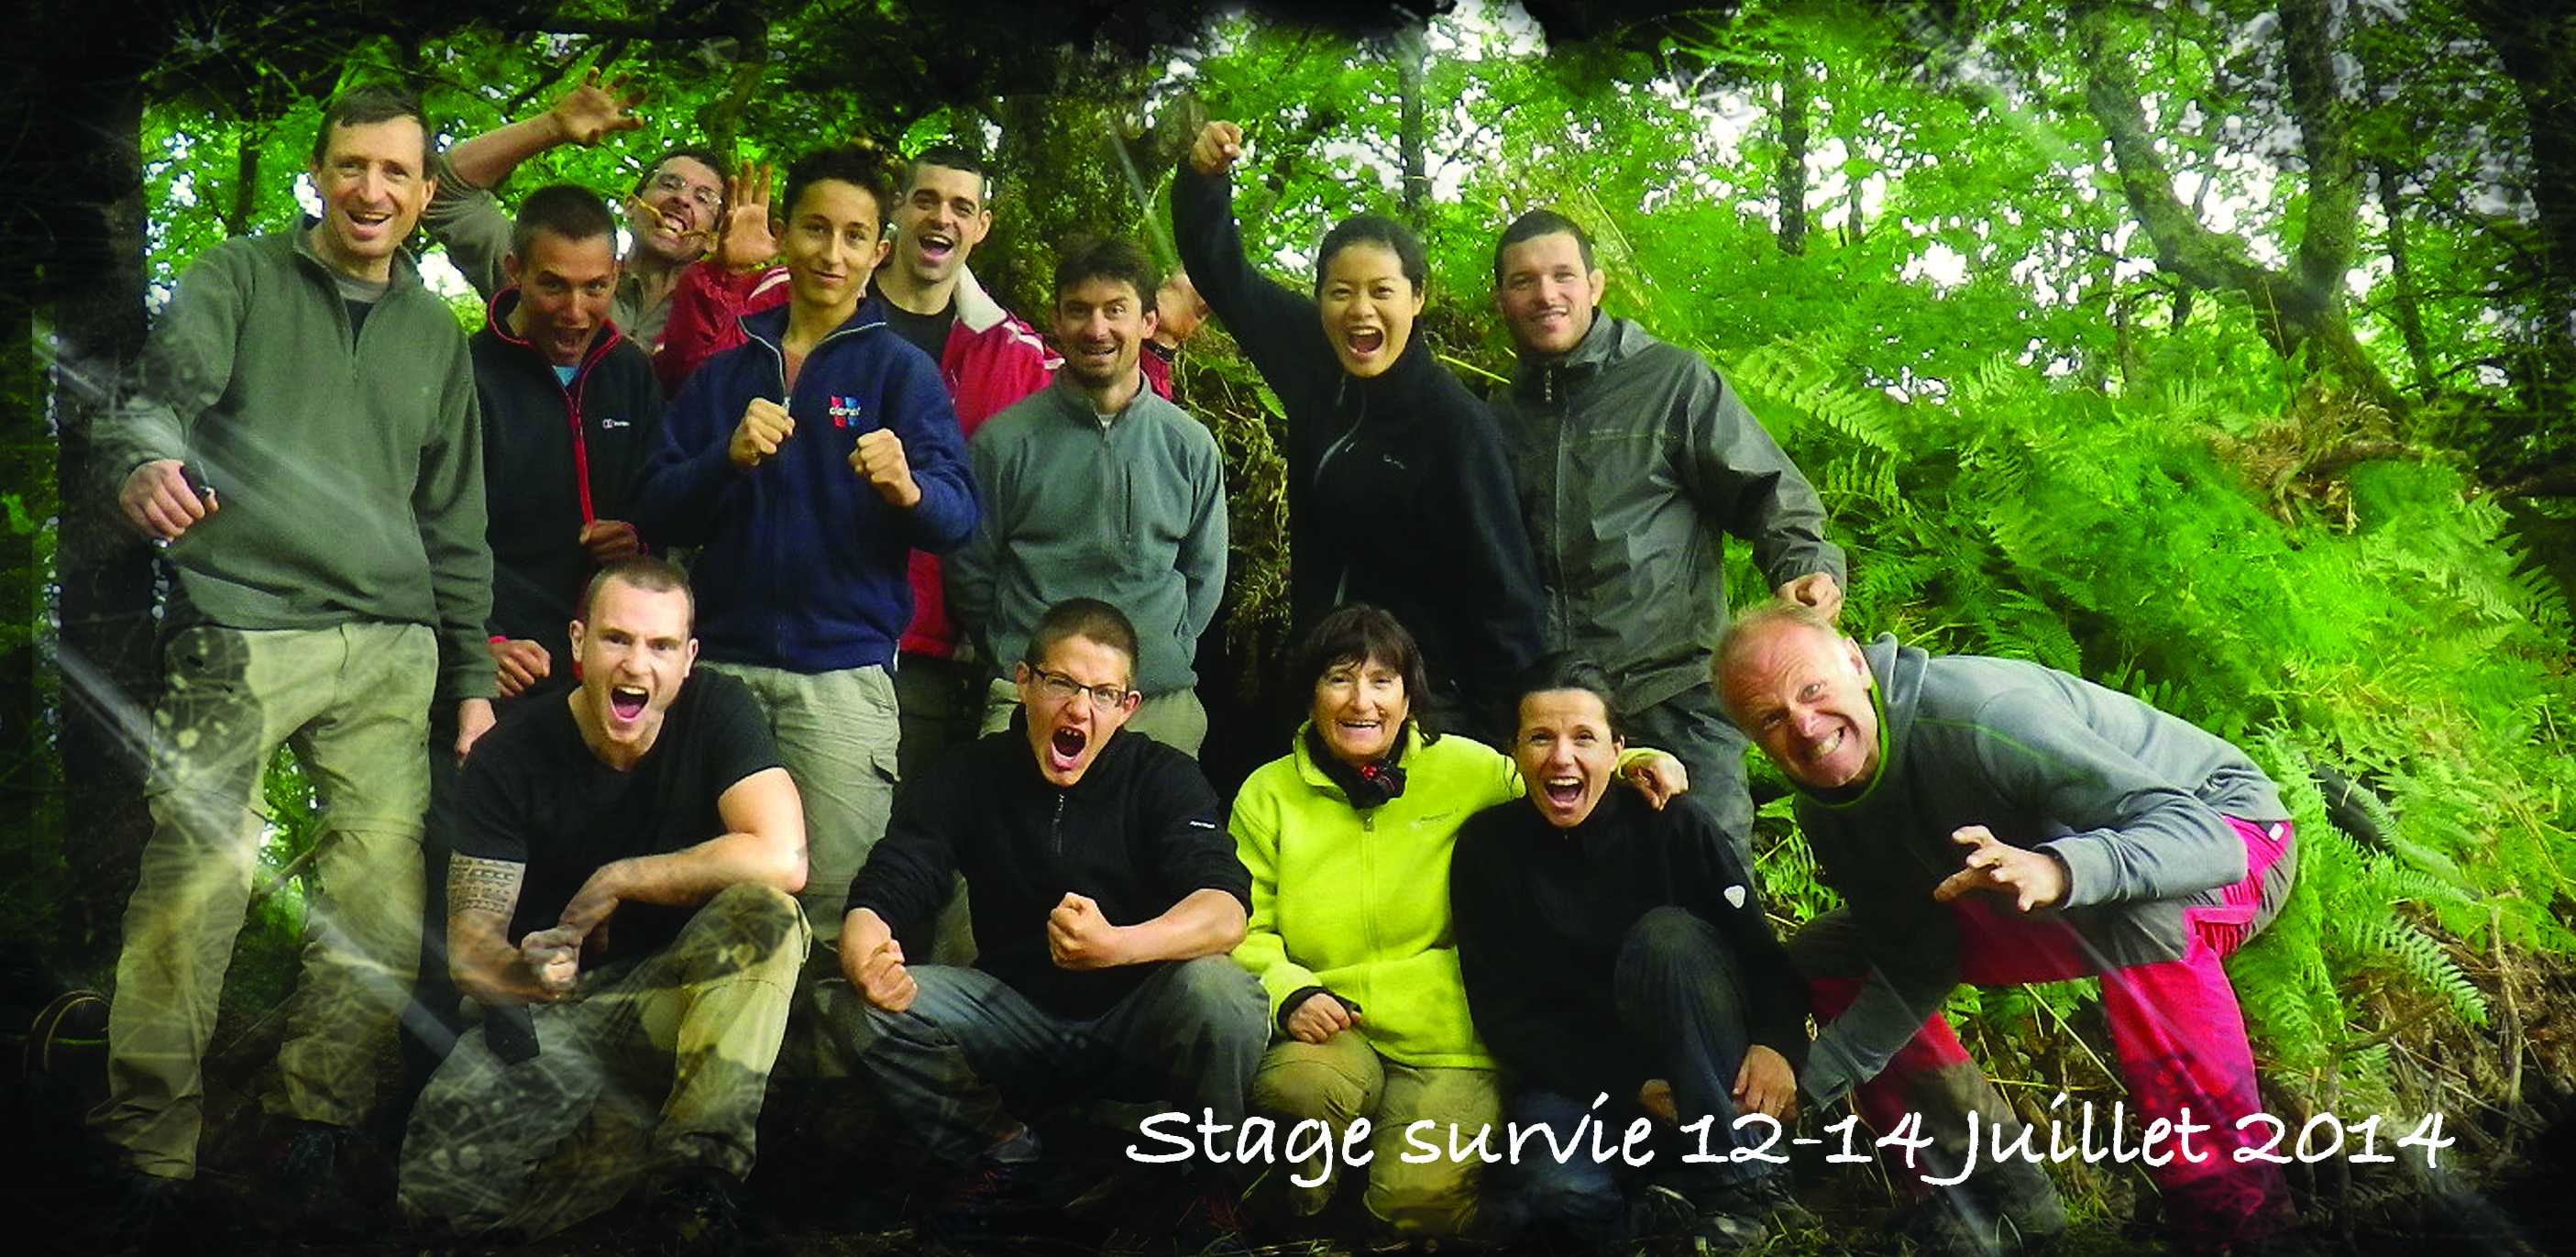 groupe 12-14 juillet 2014.jpg